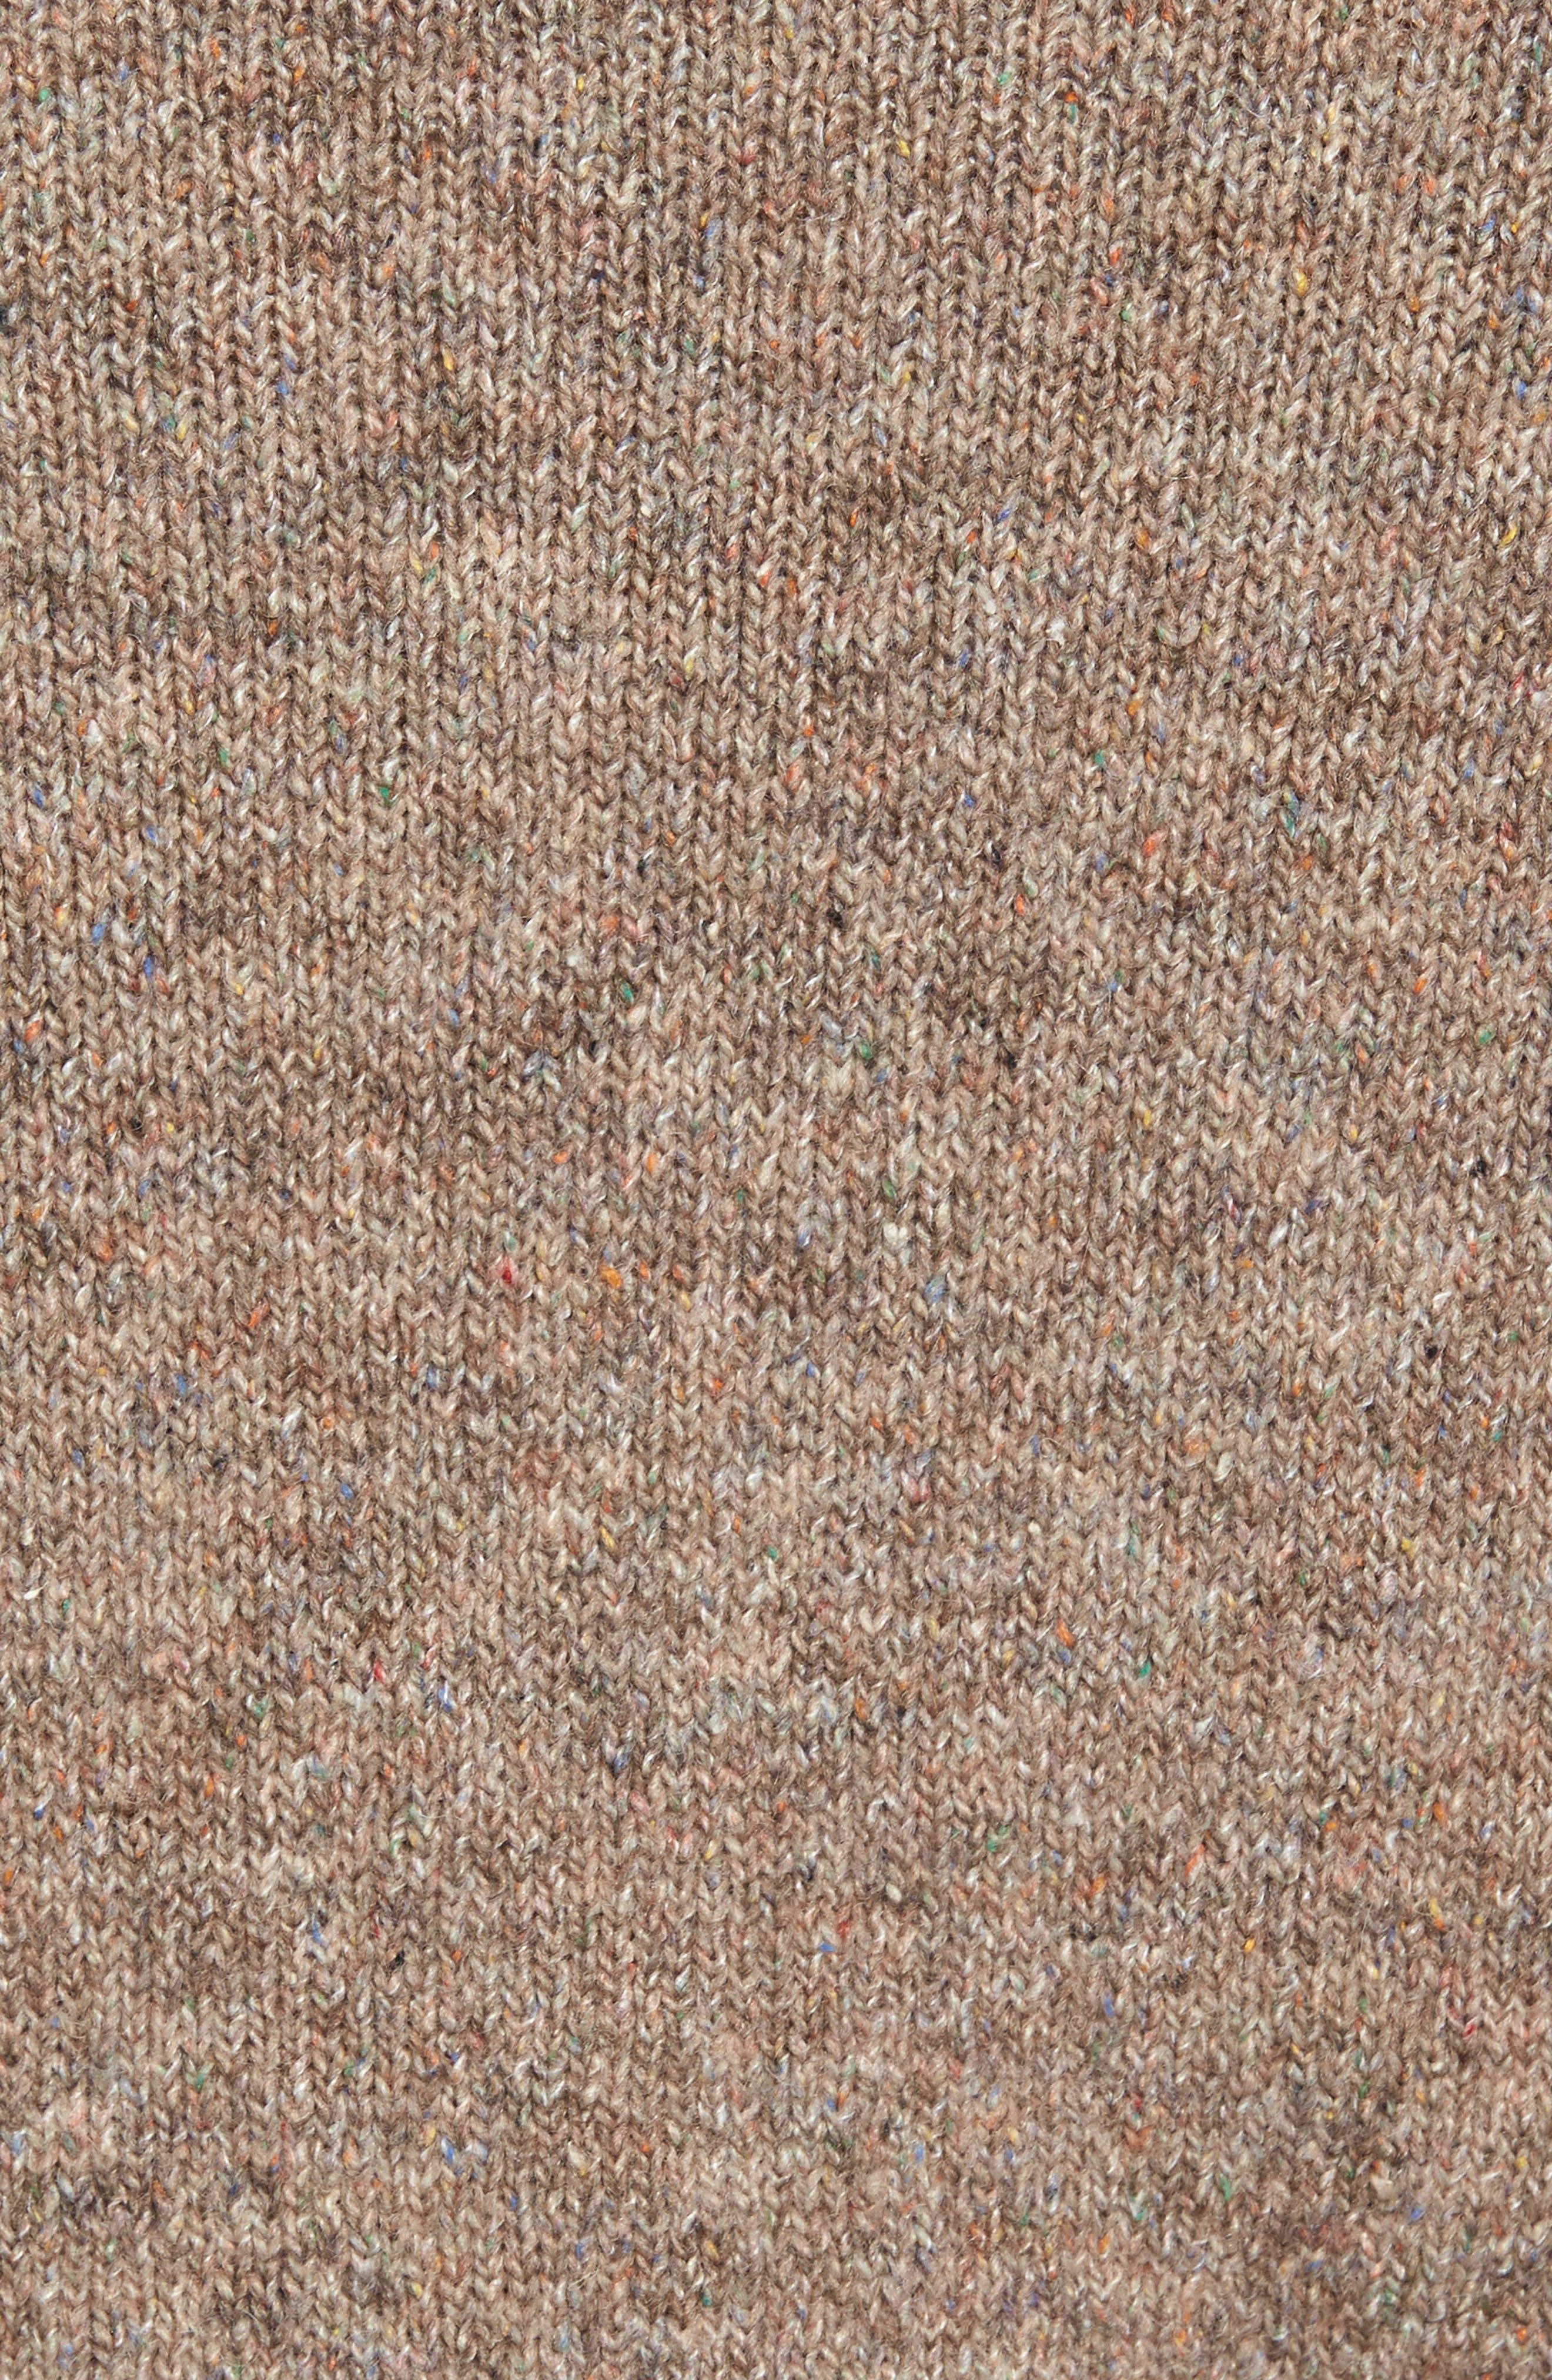 Tweed Crewneck Sweater,                             Alternate thumbnail 5, color,                             Sand